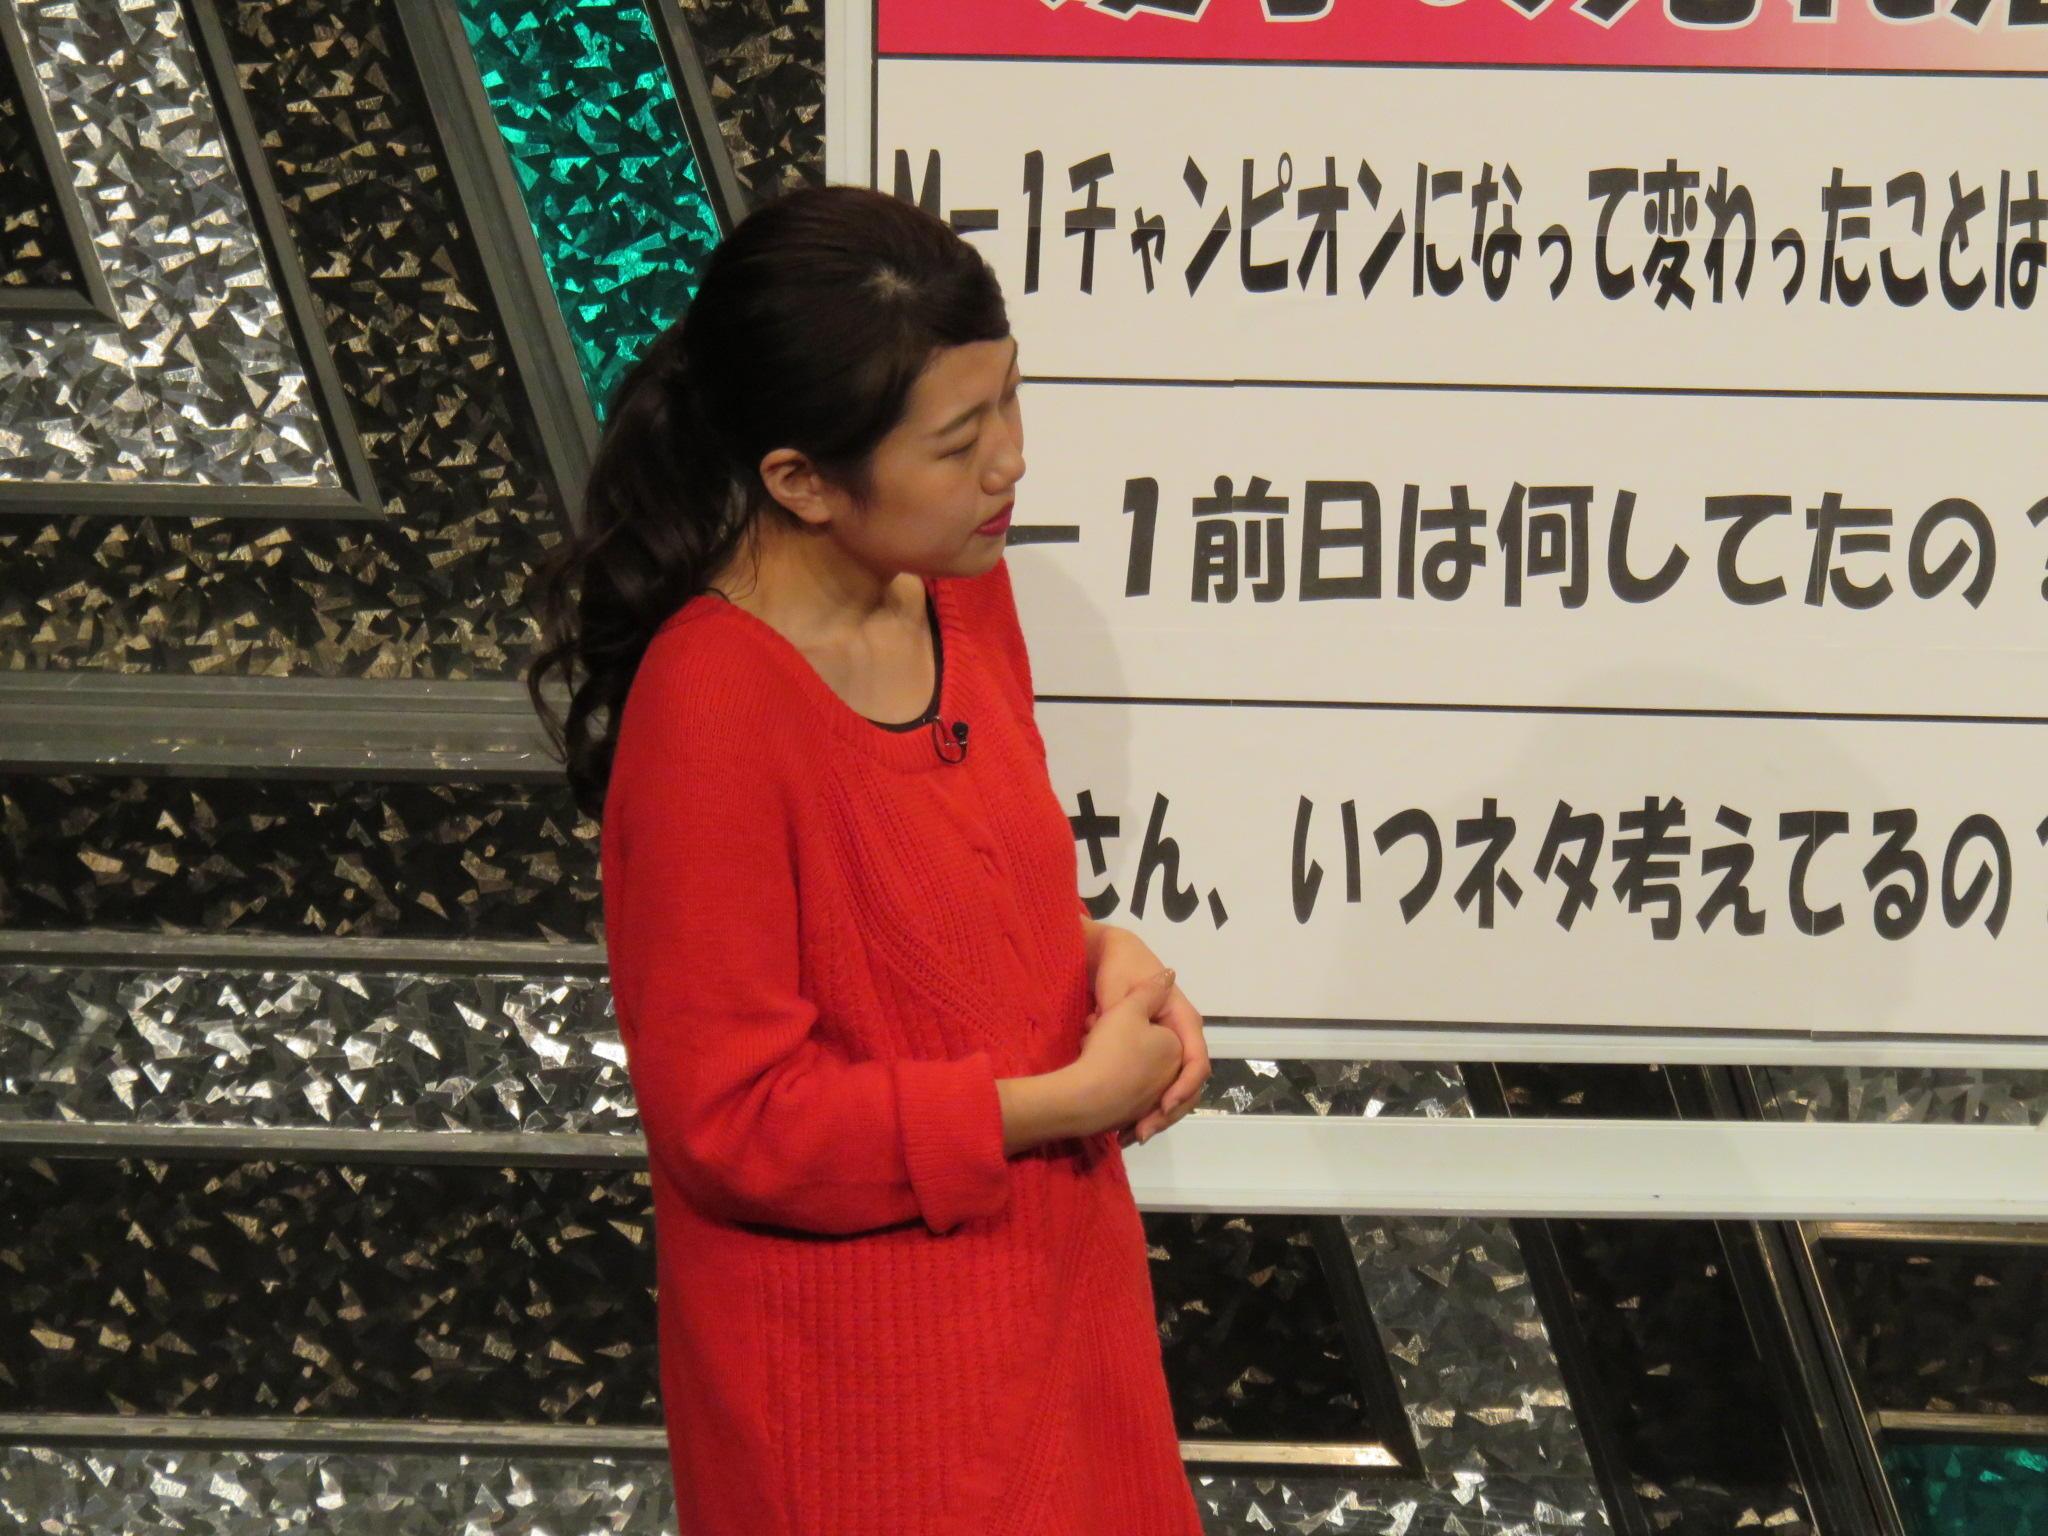 http://news.yoshimoto.co.jp/20160229222905-b291d889ca21e4cab56dd3c2bd3eec8c7cc3d9c3.jpg